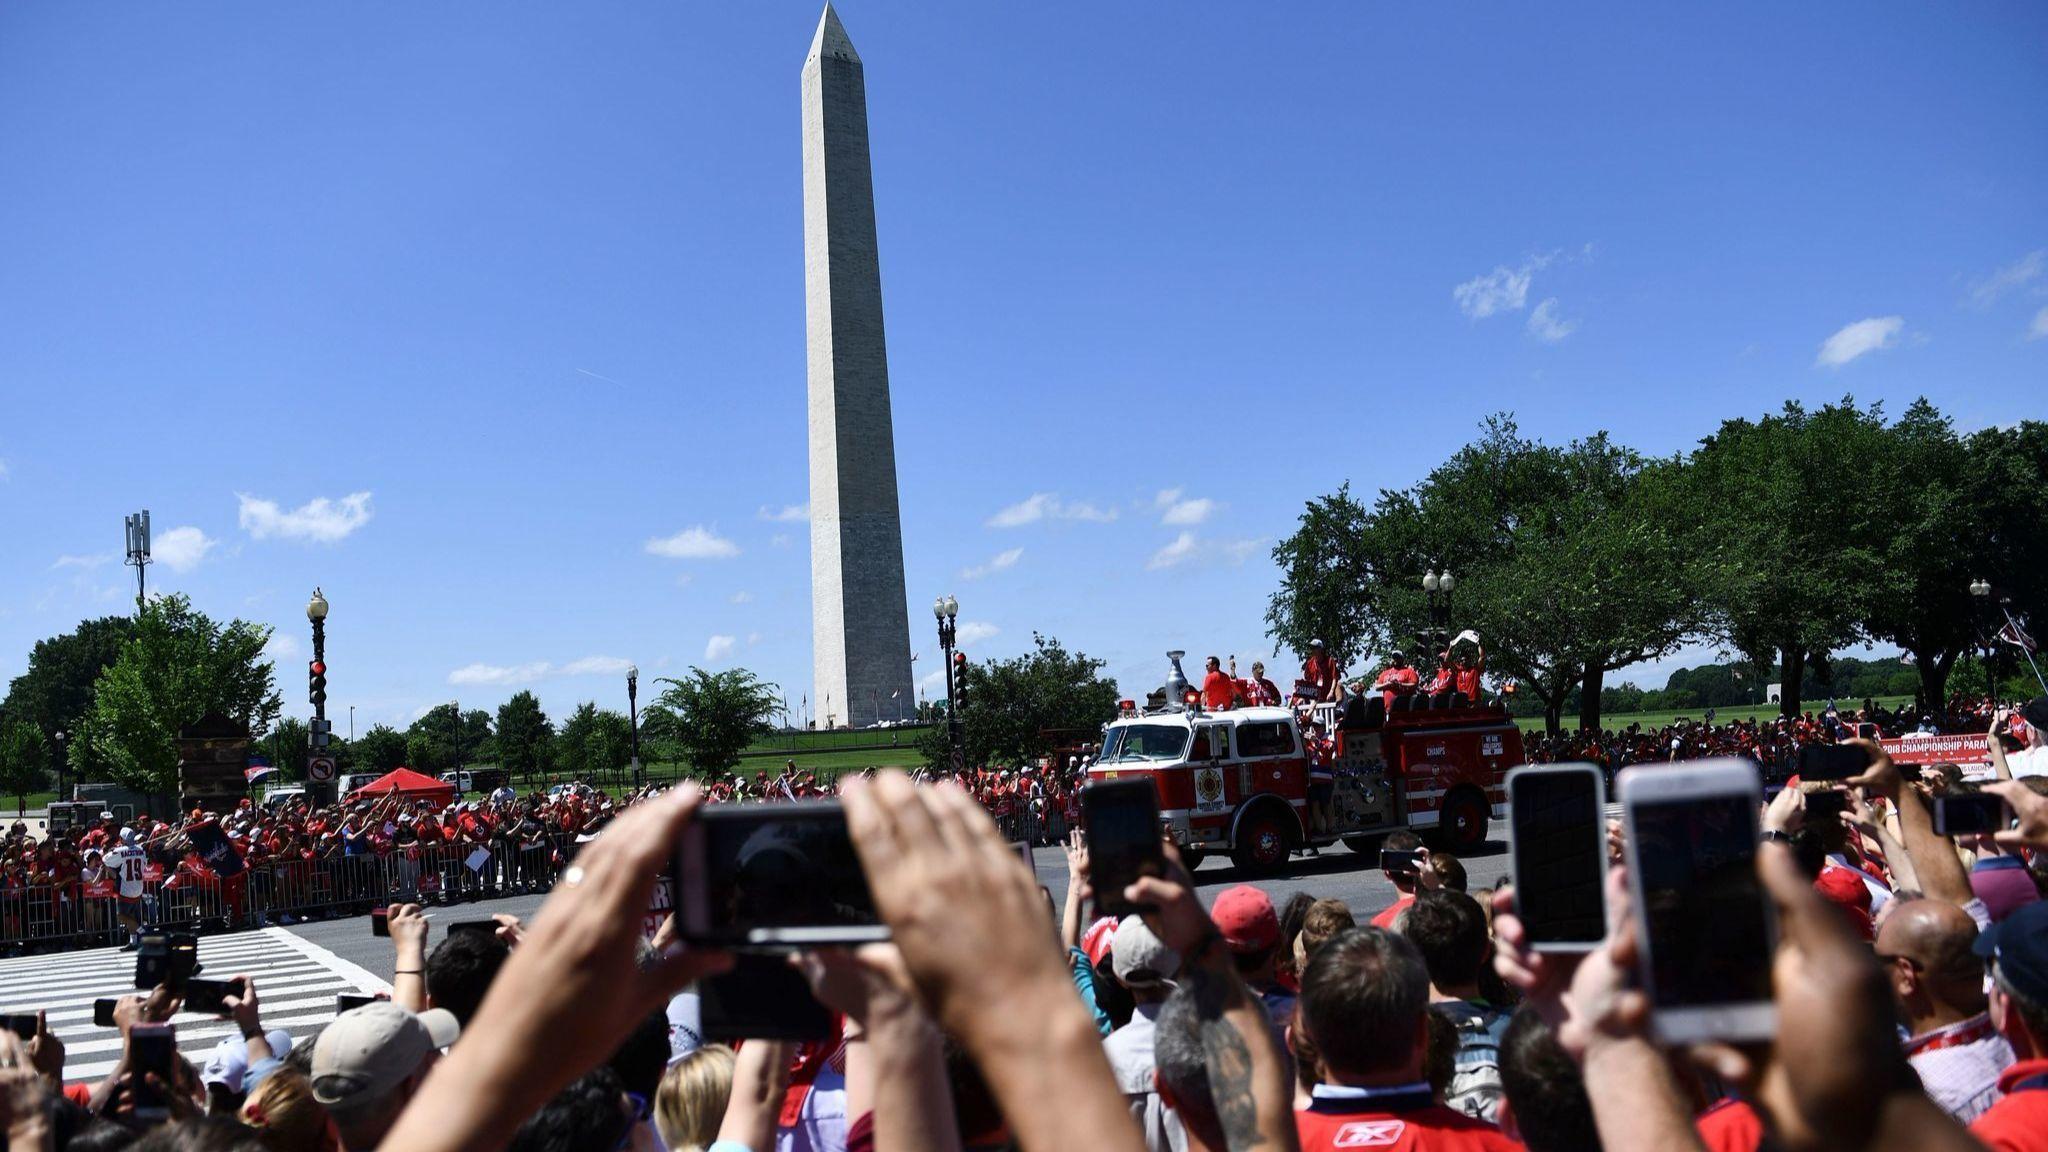 Washington Capitals' victory parade